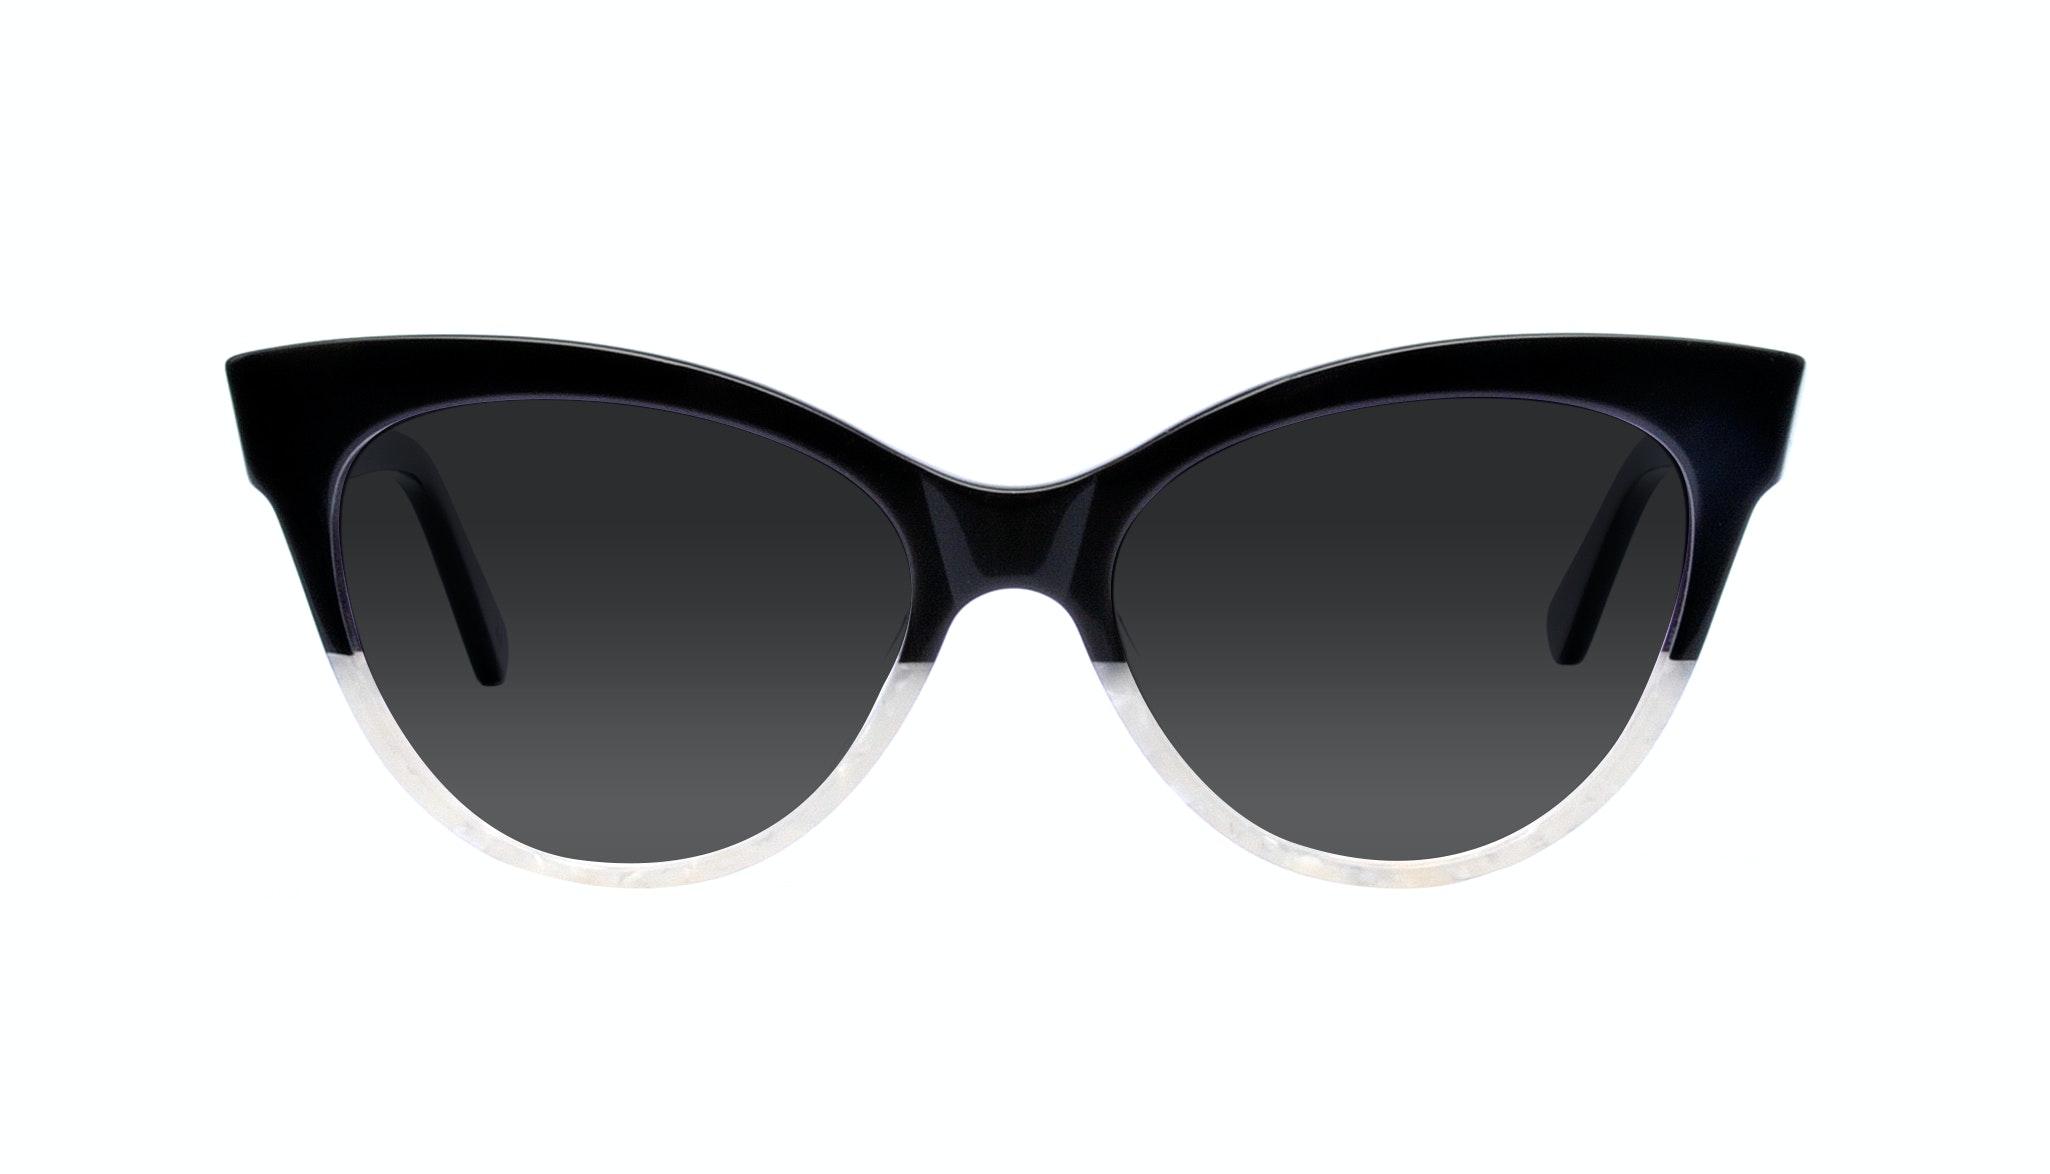 Affordable Fashion Glasses Cat Eye Square Sunglasses Women SkunkBoy Panda Pearl Front